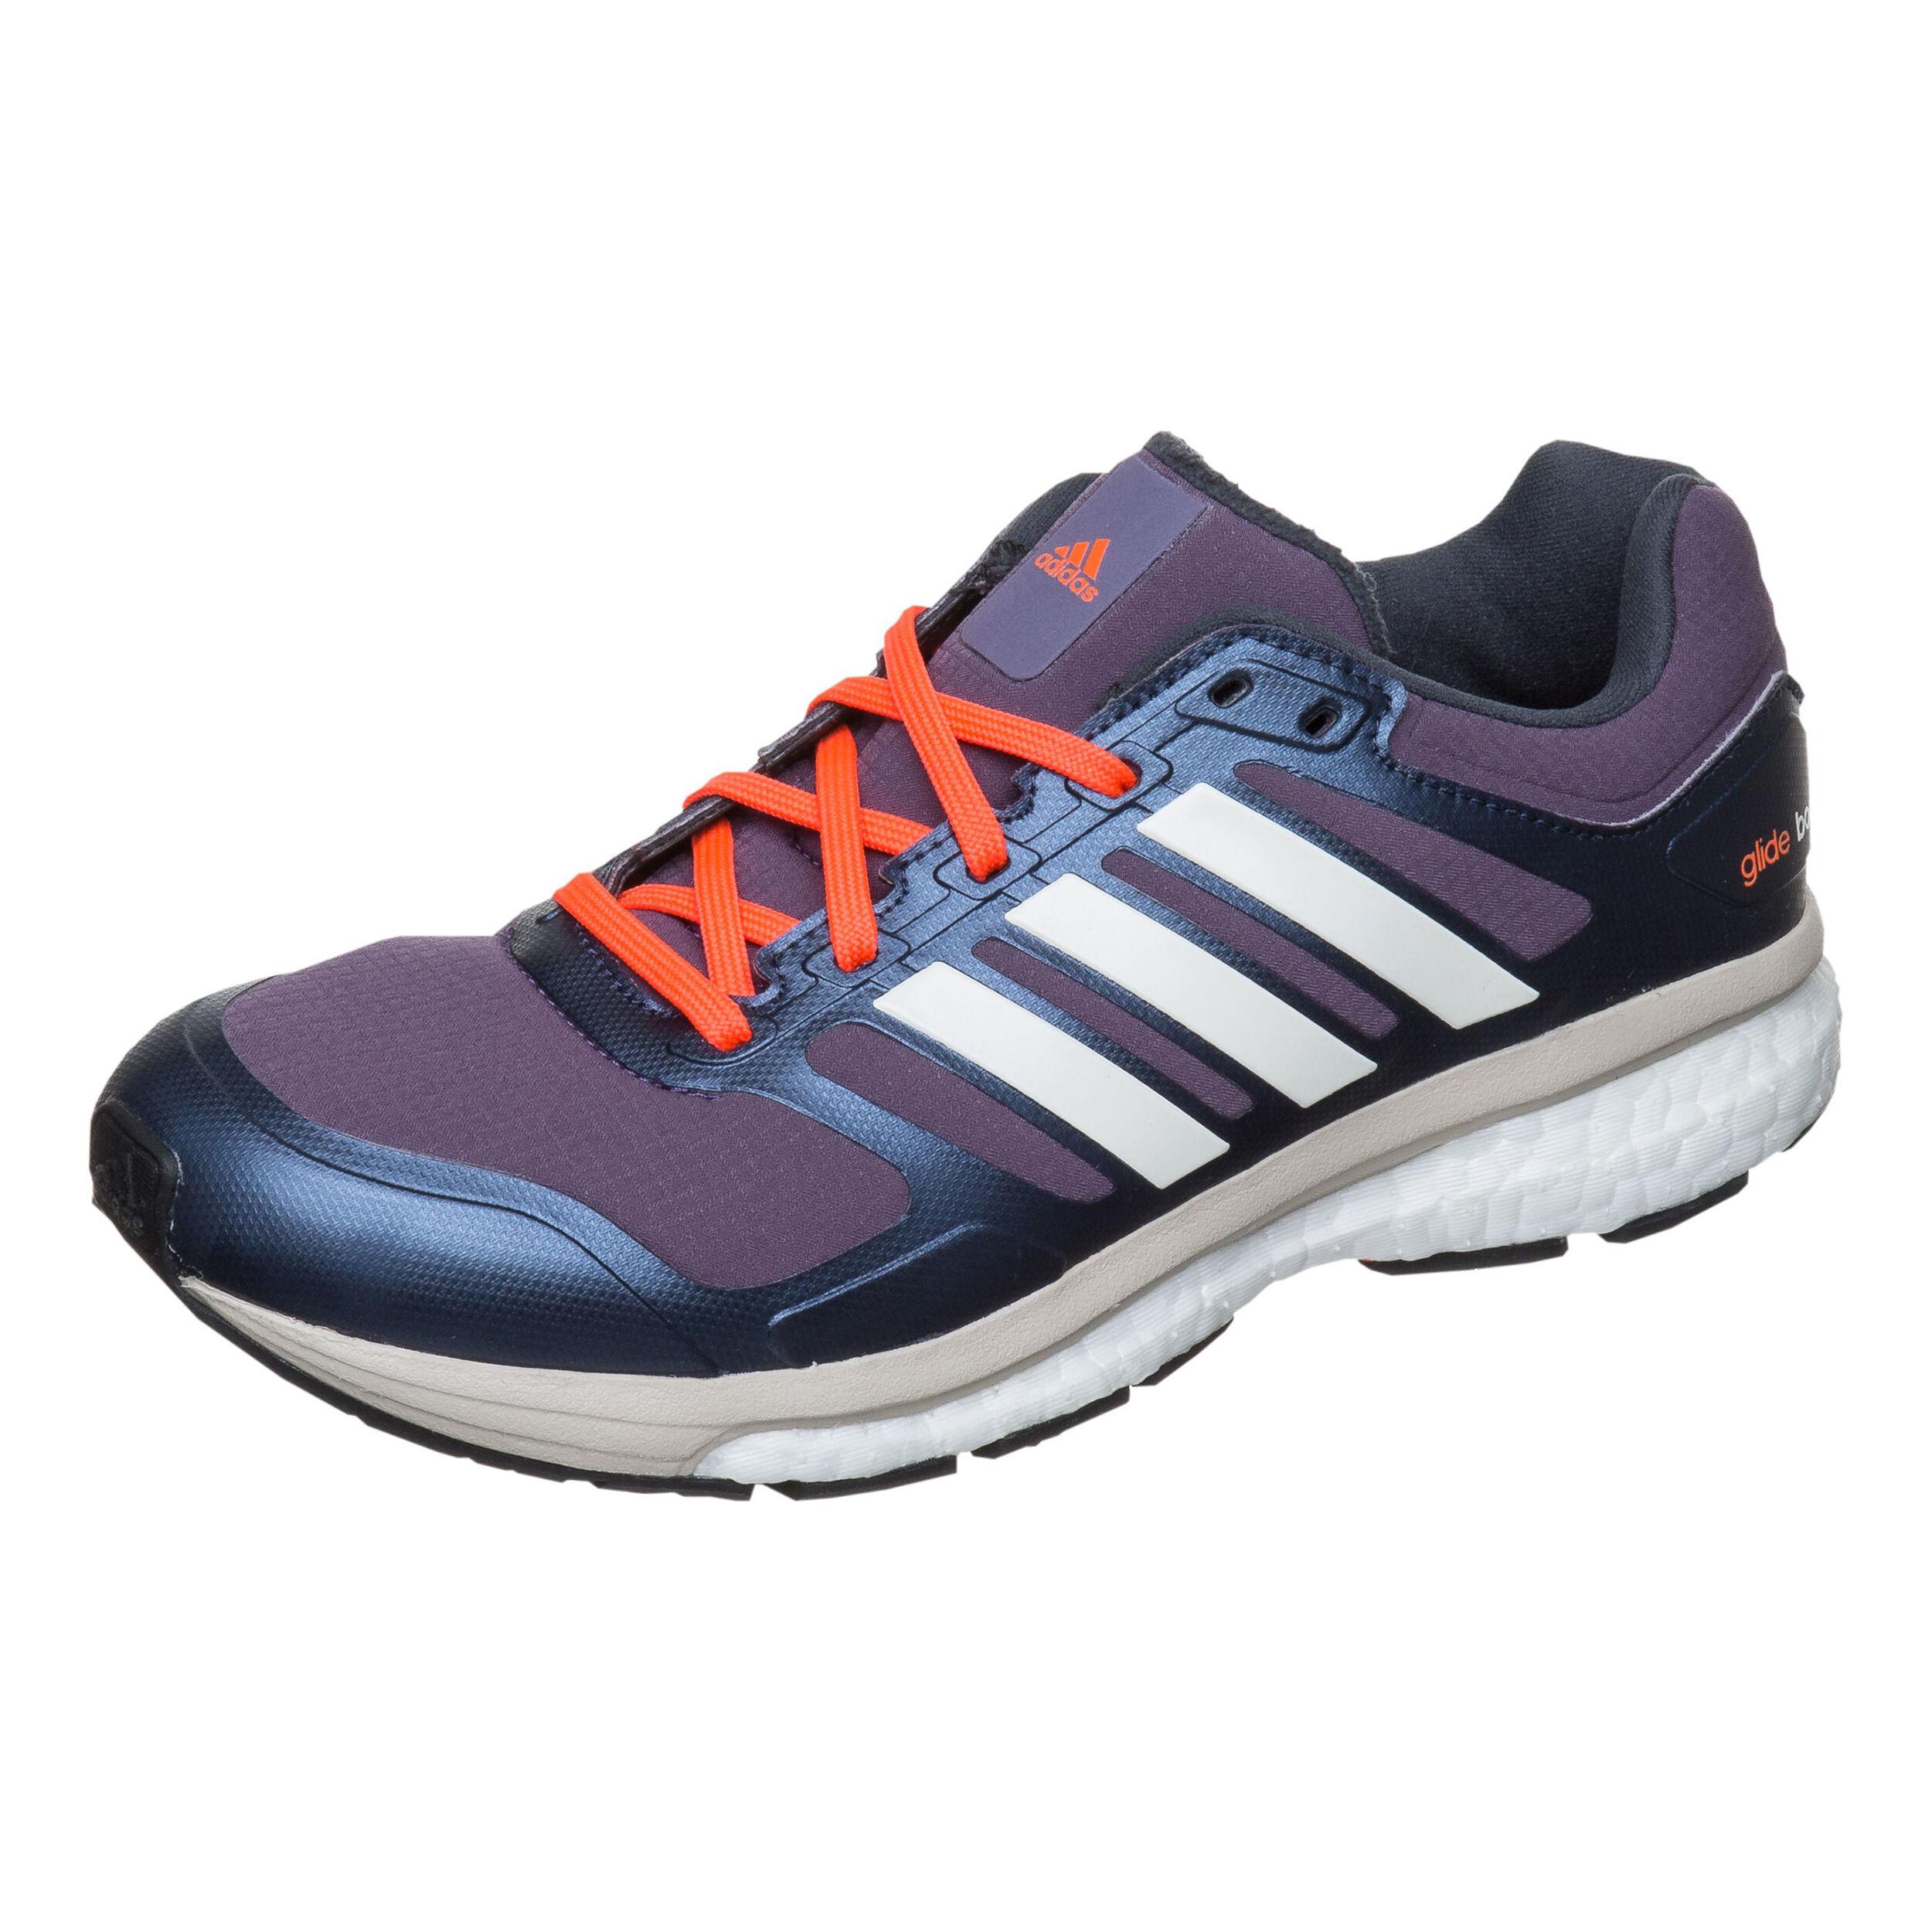 ADIDAS BOOST REVENGE Damen Sneaker Schuhe Sport Gr.39 13